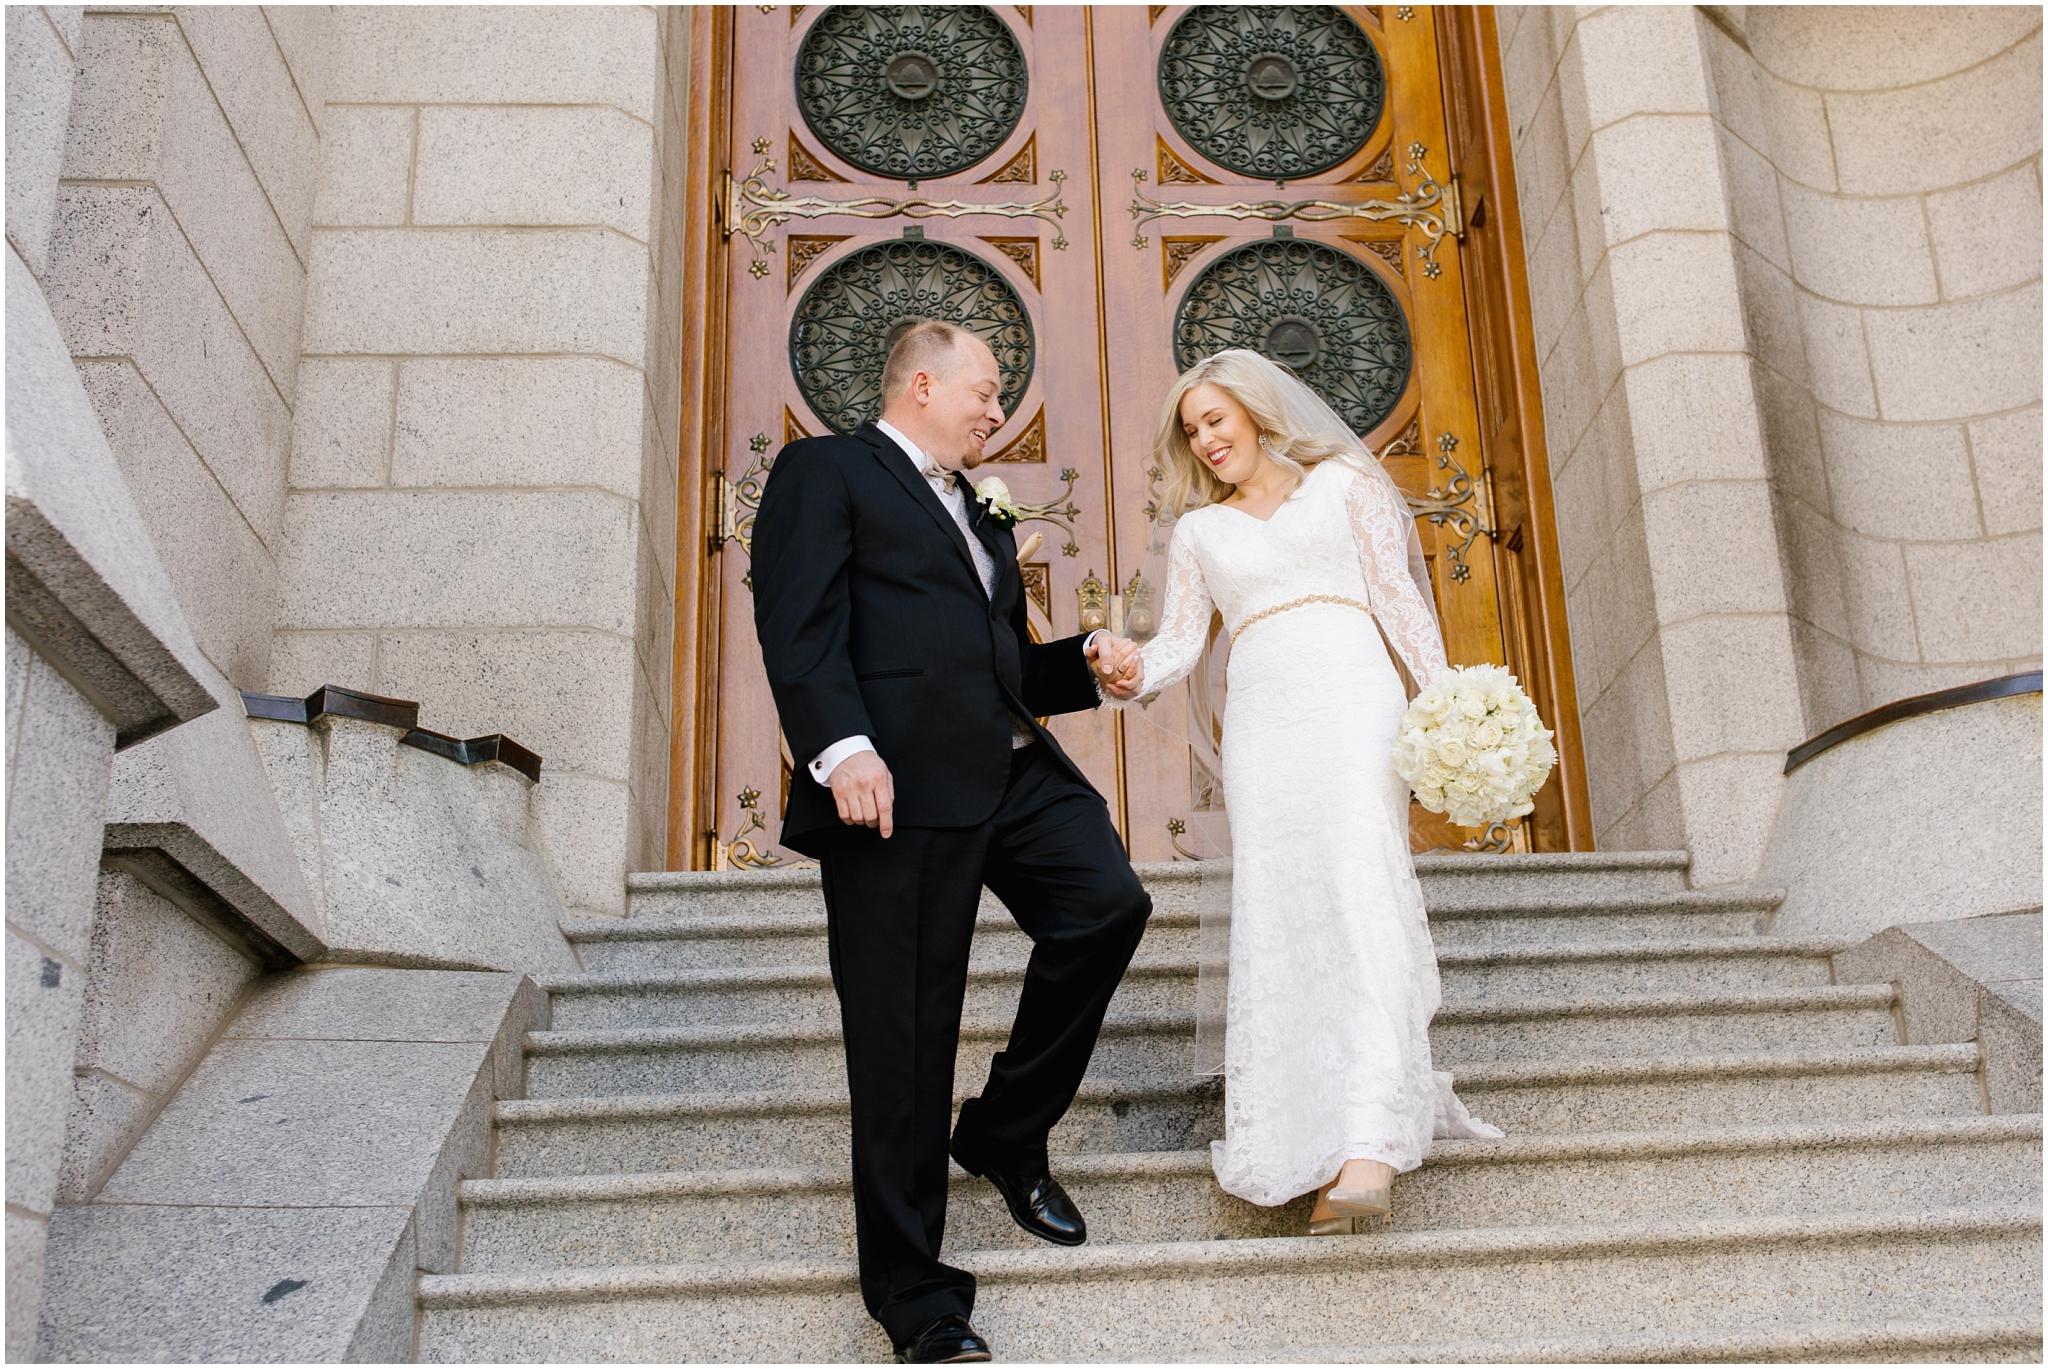 CherylandTyler-156_Lizzie-B-Imagery-Utah-Wedding-Photographer-Salt-Lake-City-Temple-Wells-Fargo-Building-Reception.jpg